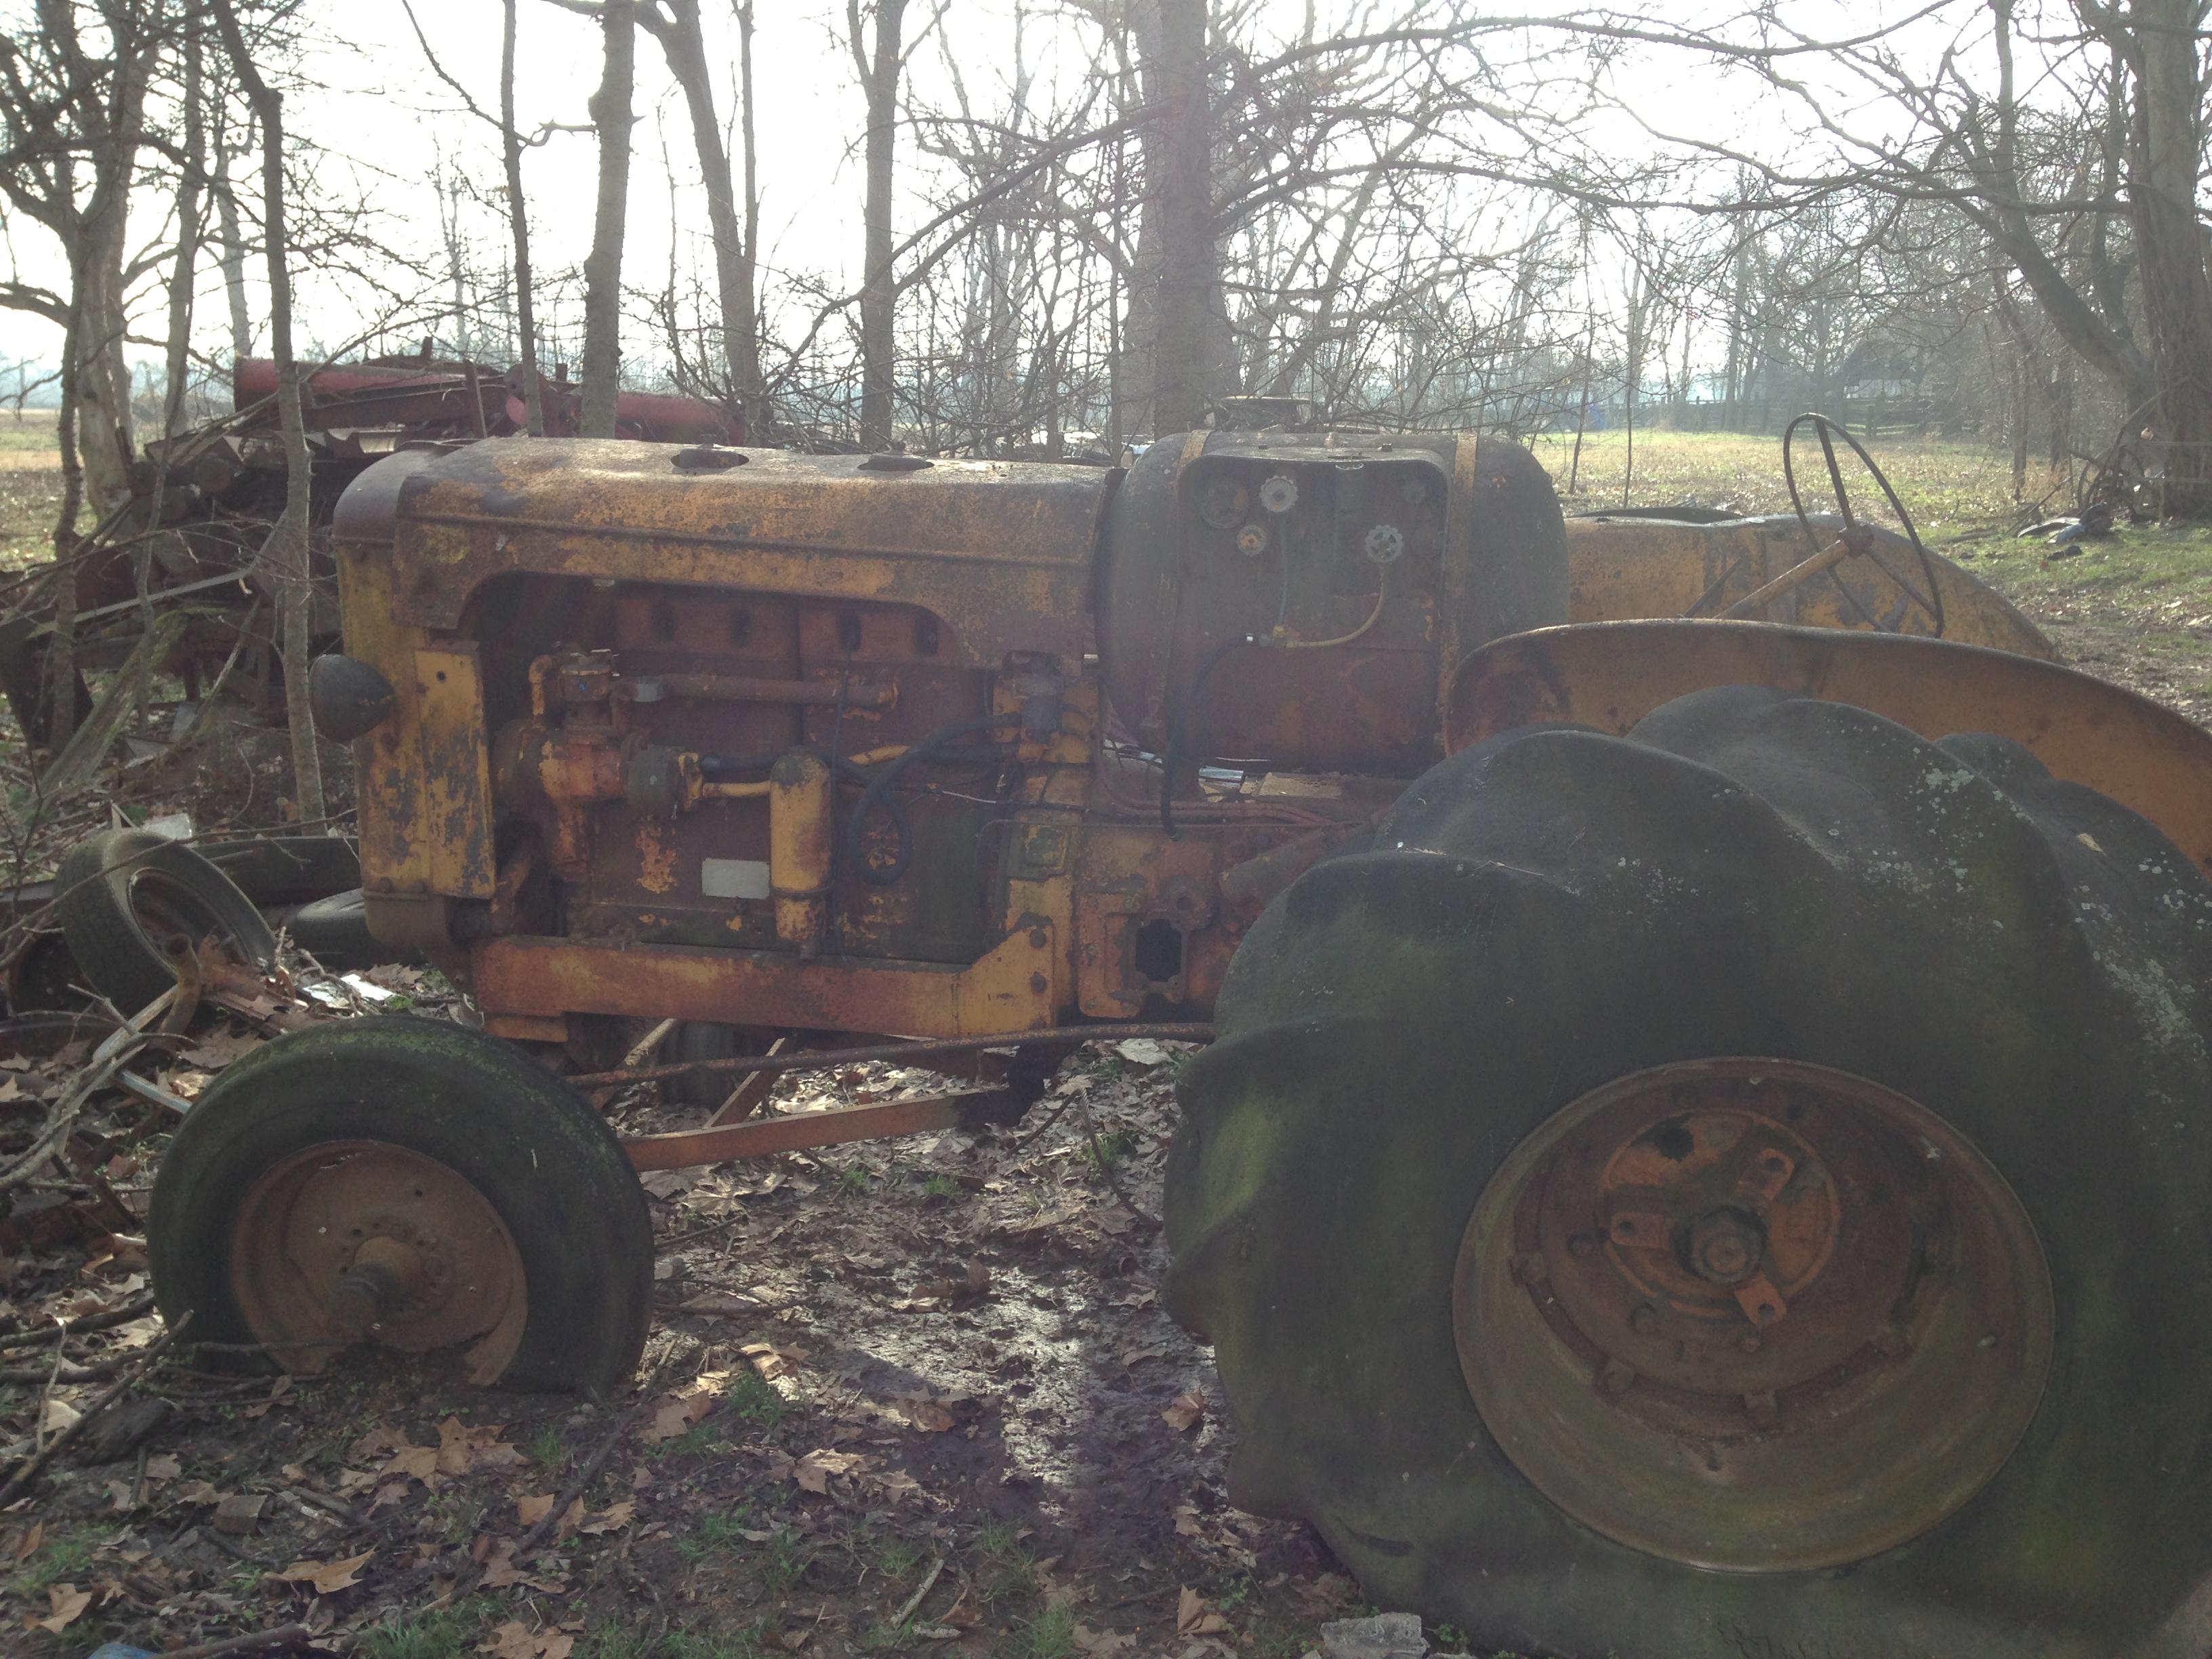 Minneapolis-Moline G Tractor